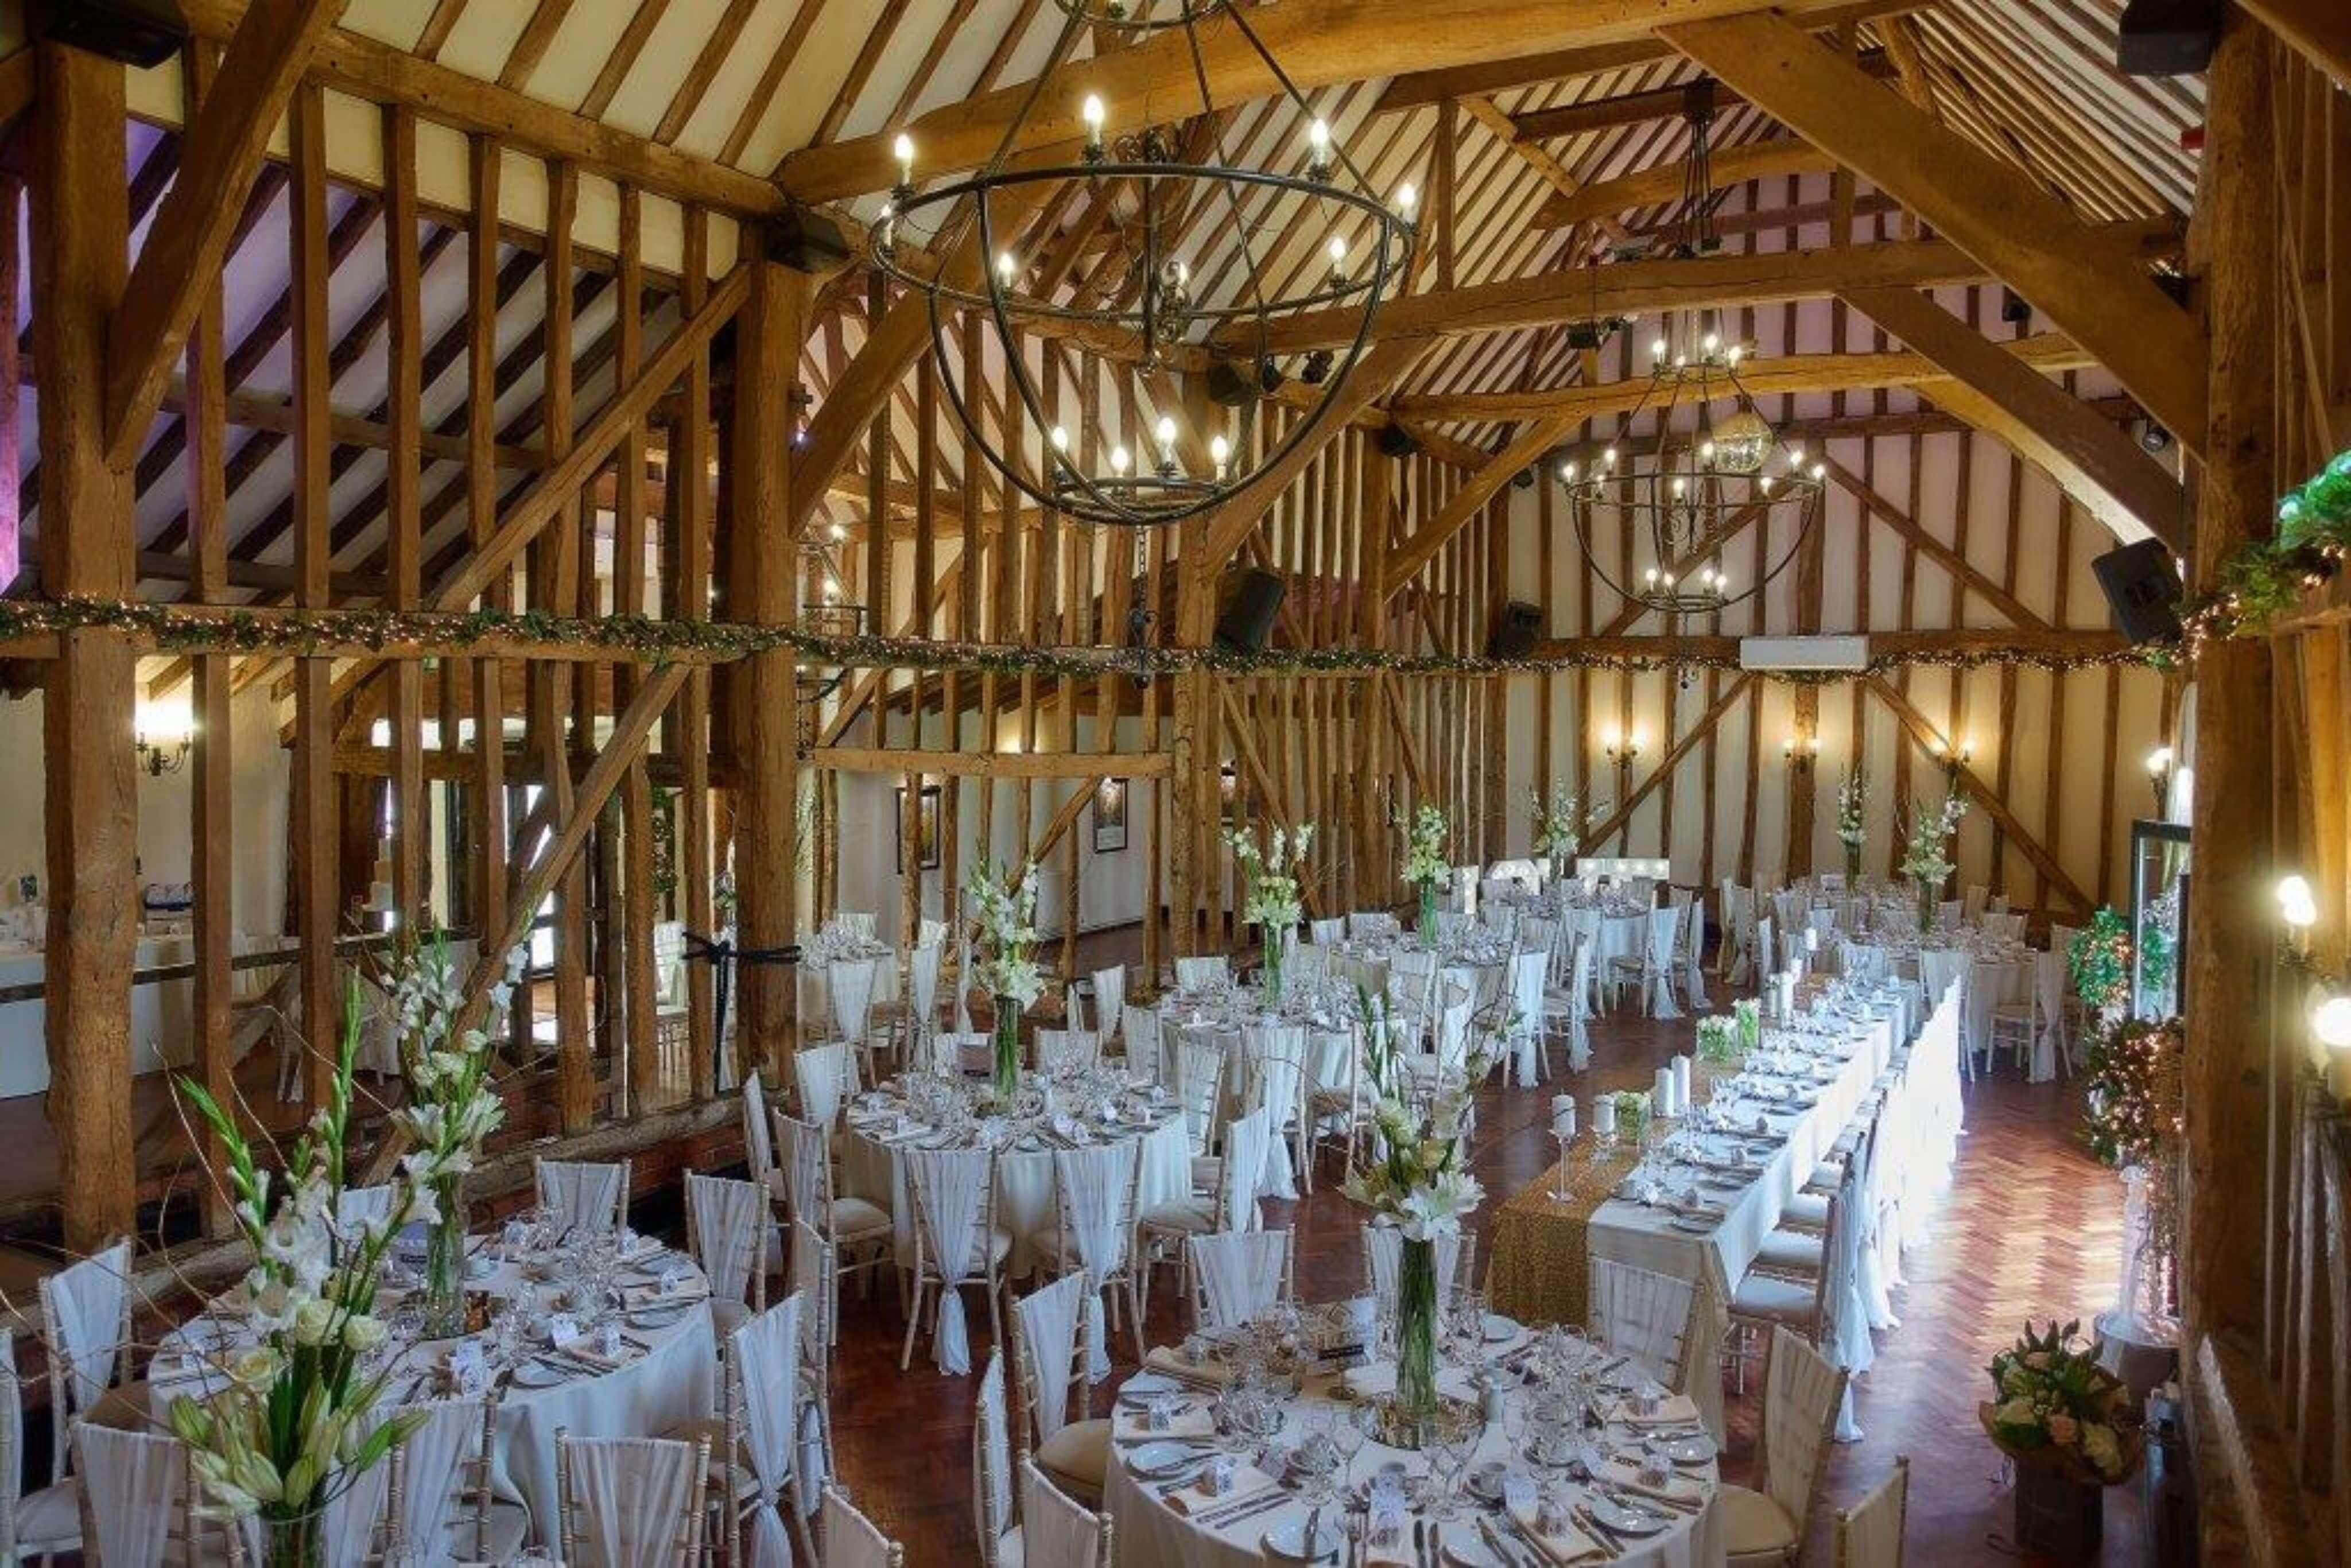 5 Reasons to Choose a Barn Wedding Venue